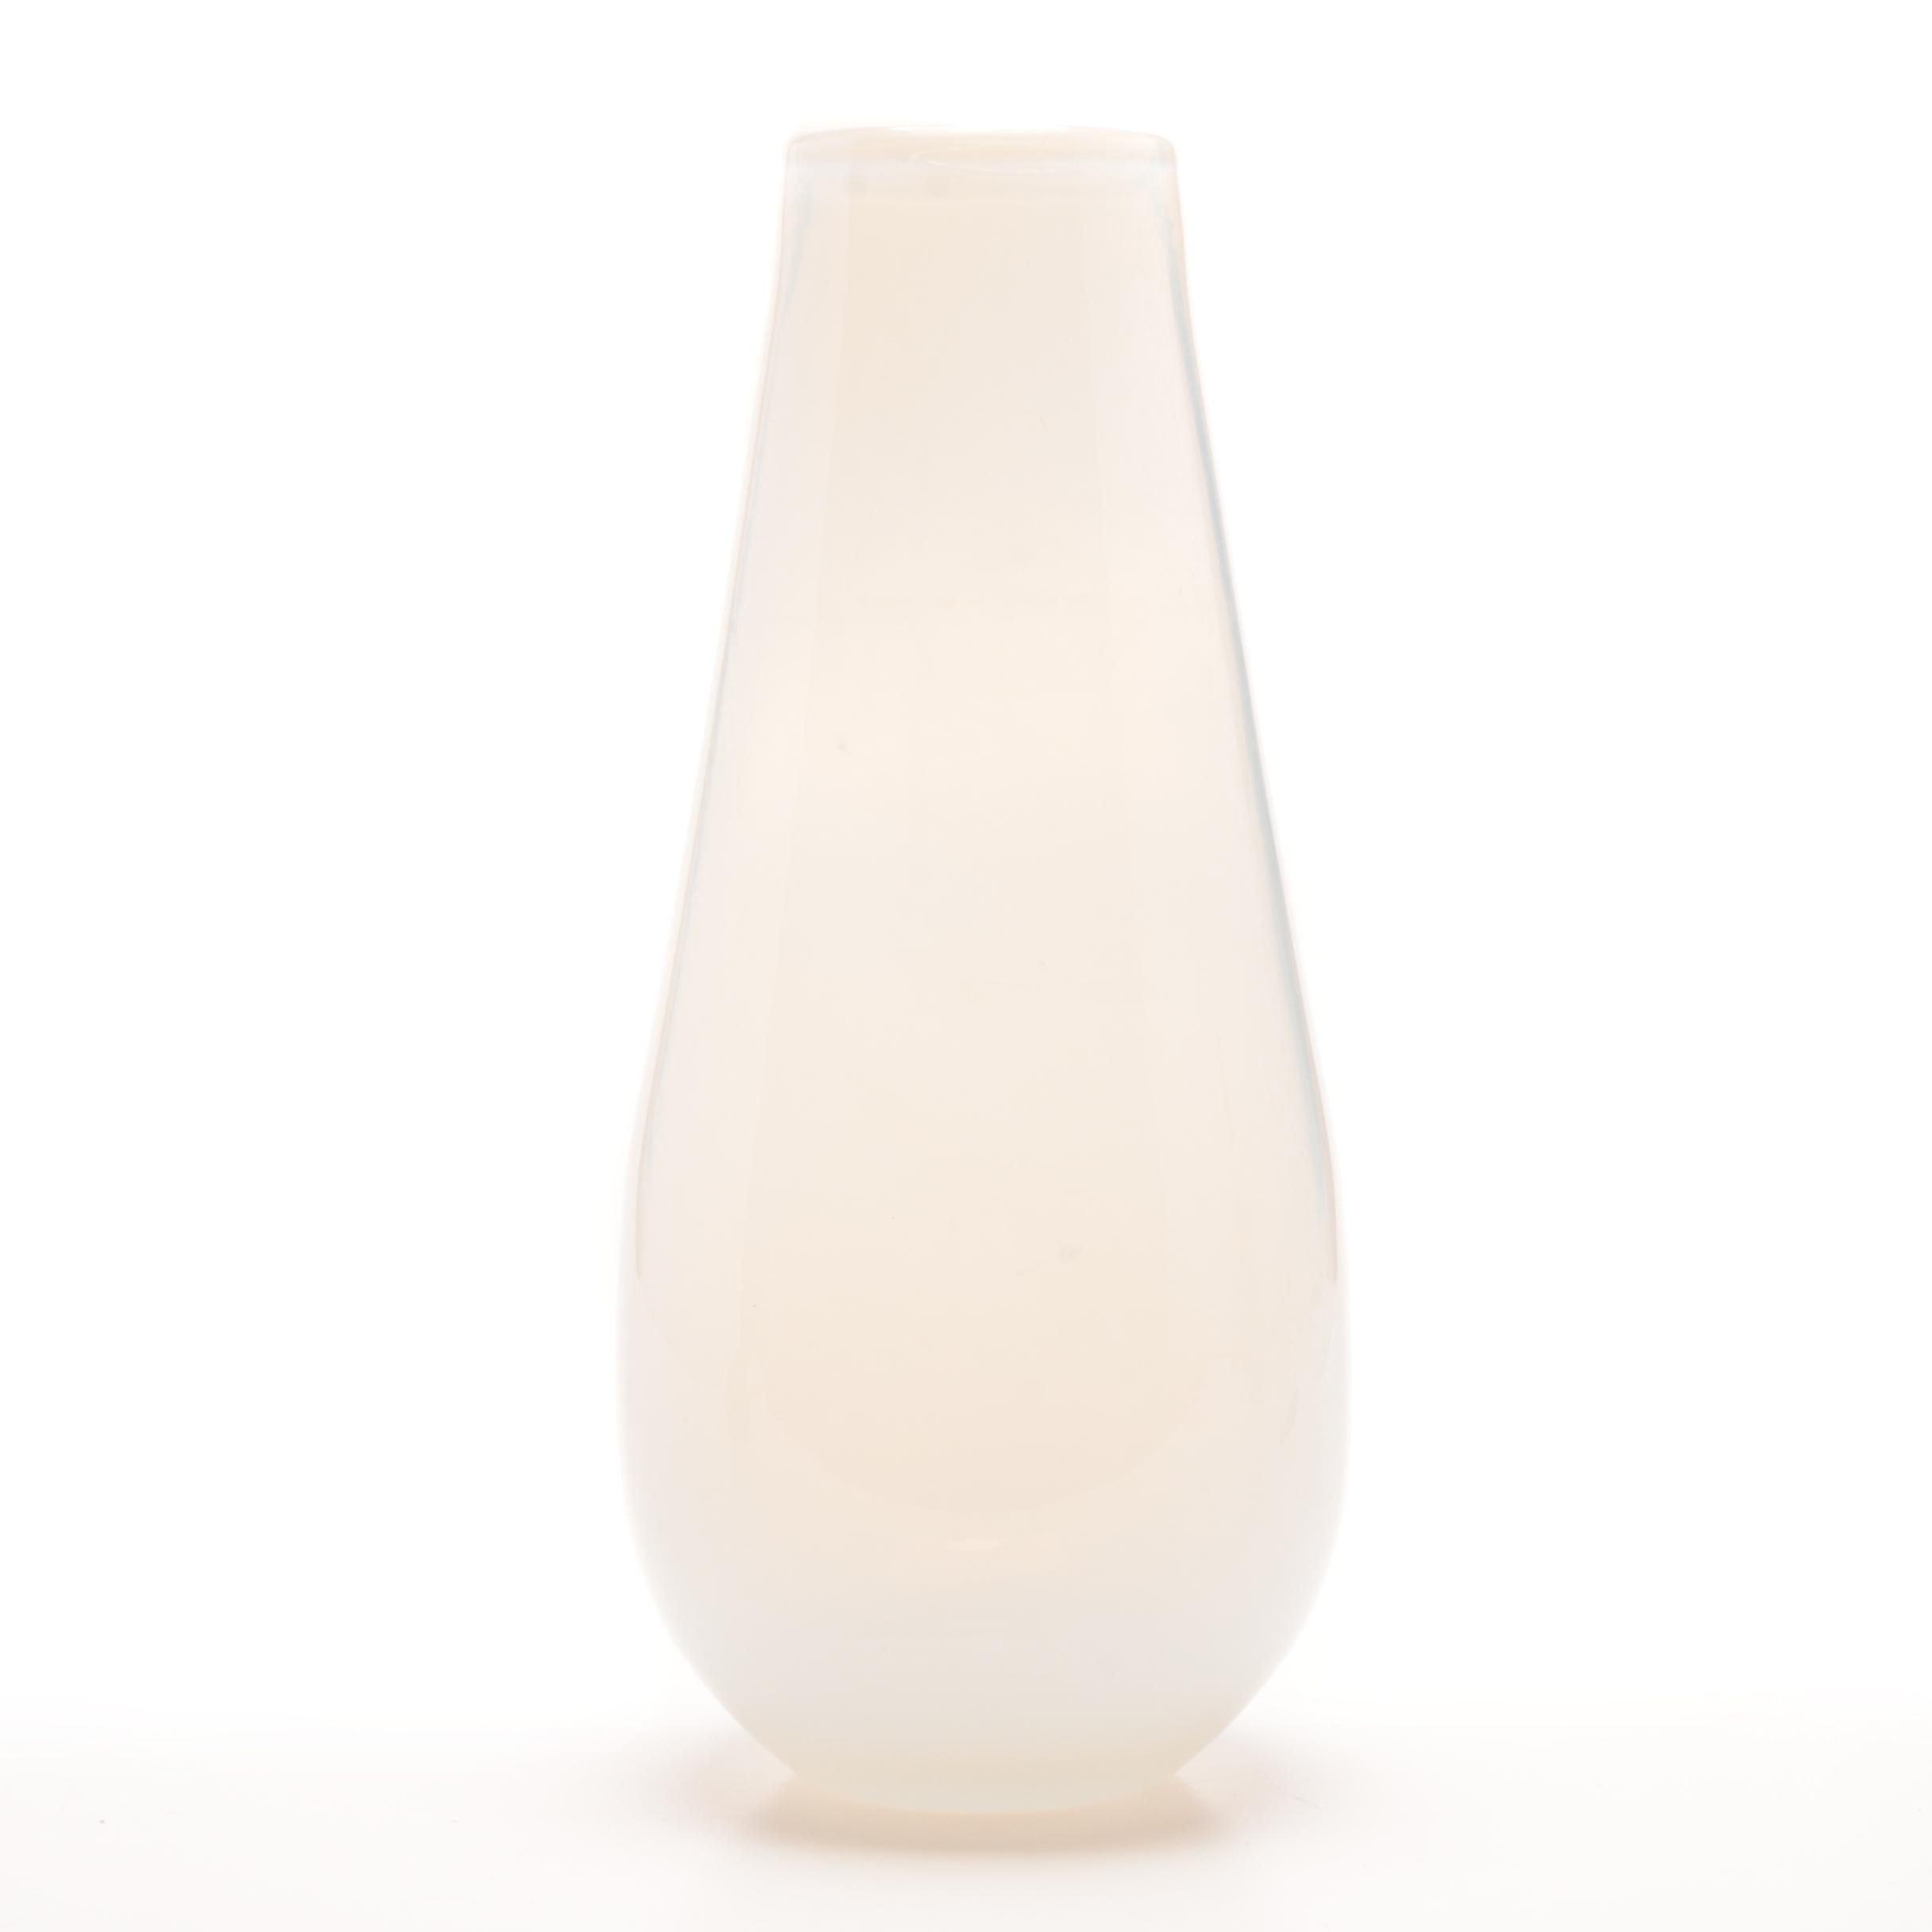 Art Glass Opalescent Blown Vase